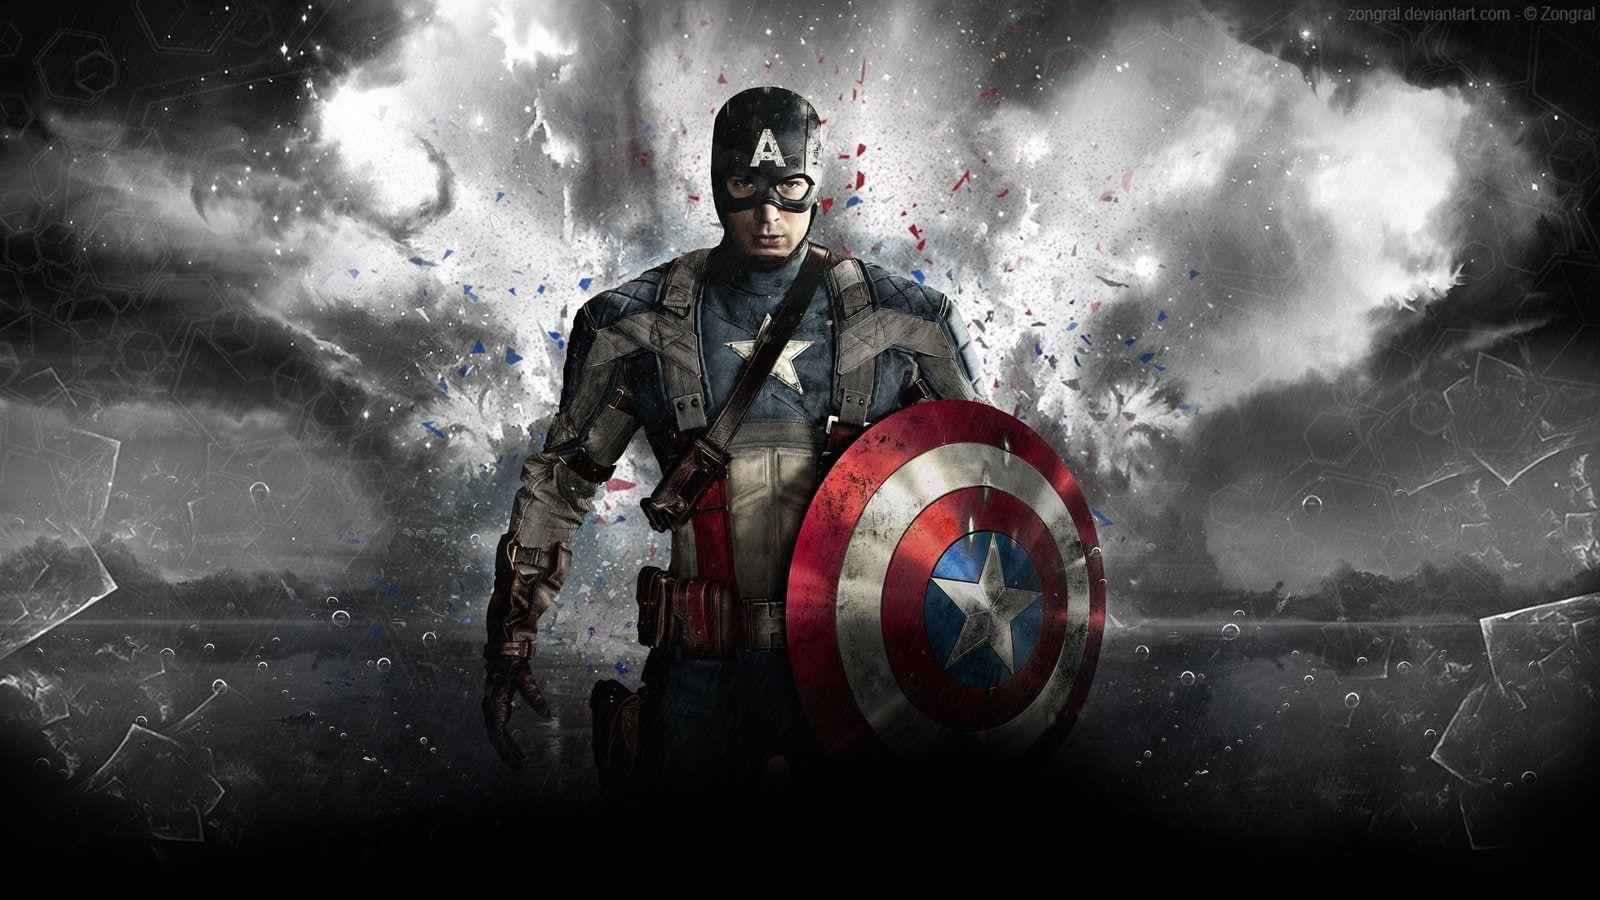 Captain America Shield Marvel Chris Evans Hd Movies Marvel America Captain Shield Chris Captain America Wallpaper Avengers Wallpaper Hd Wallpapers For Pc